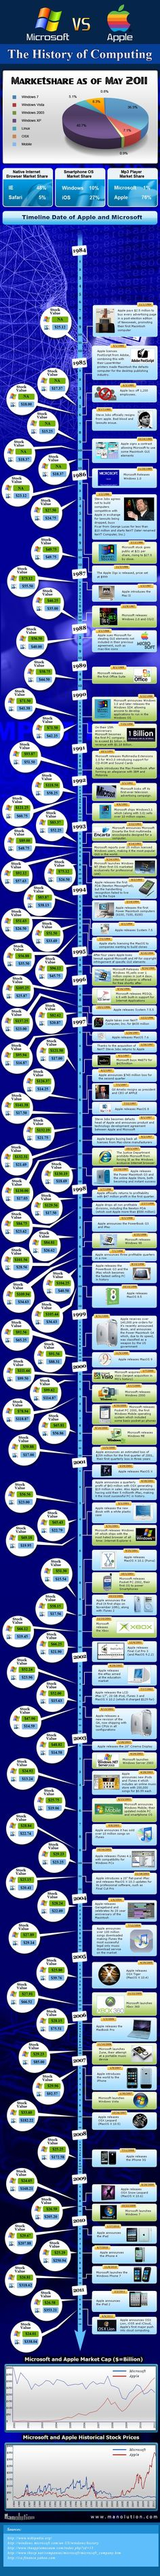 Microsoft vs Apple: The History of Computing